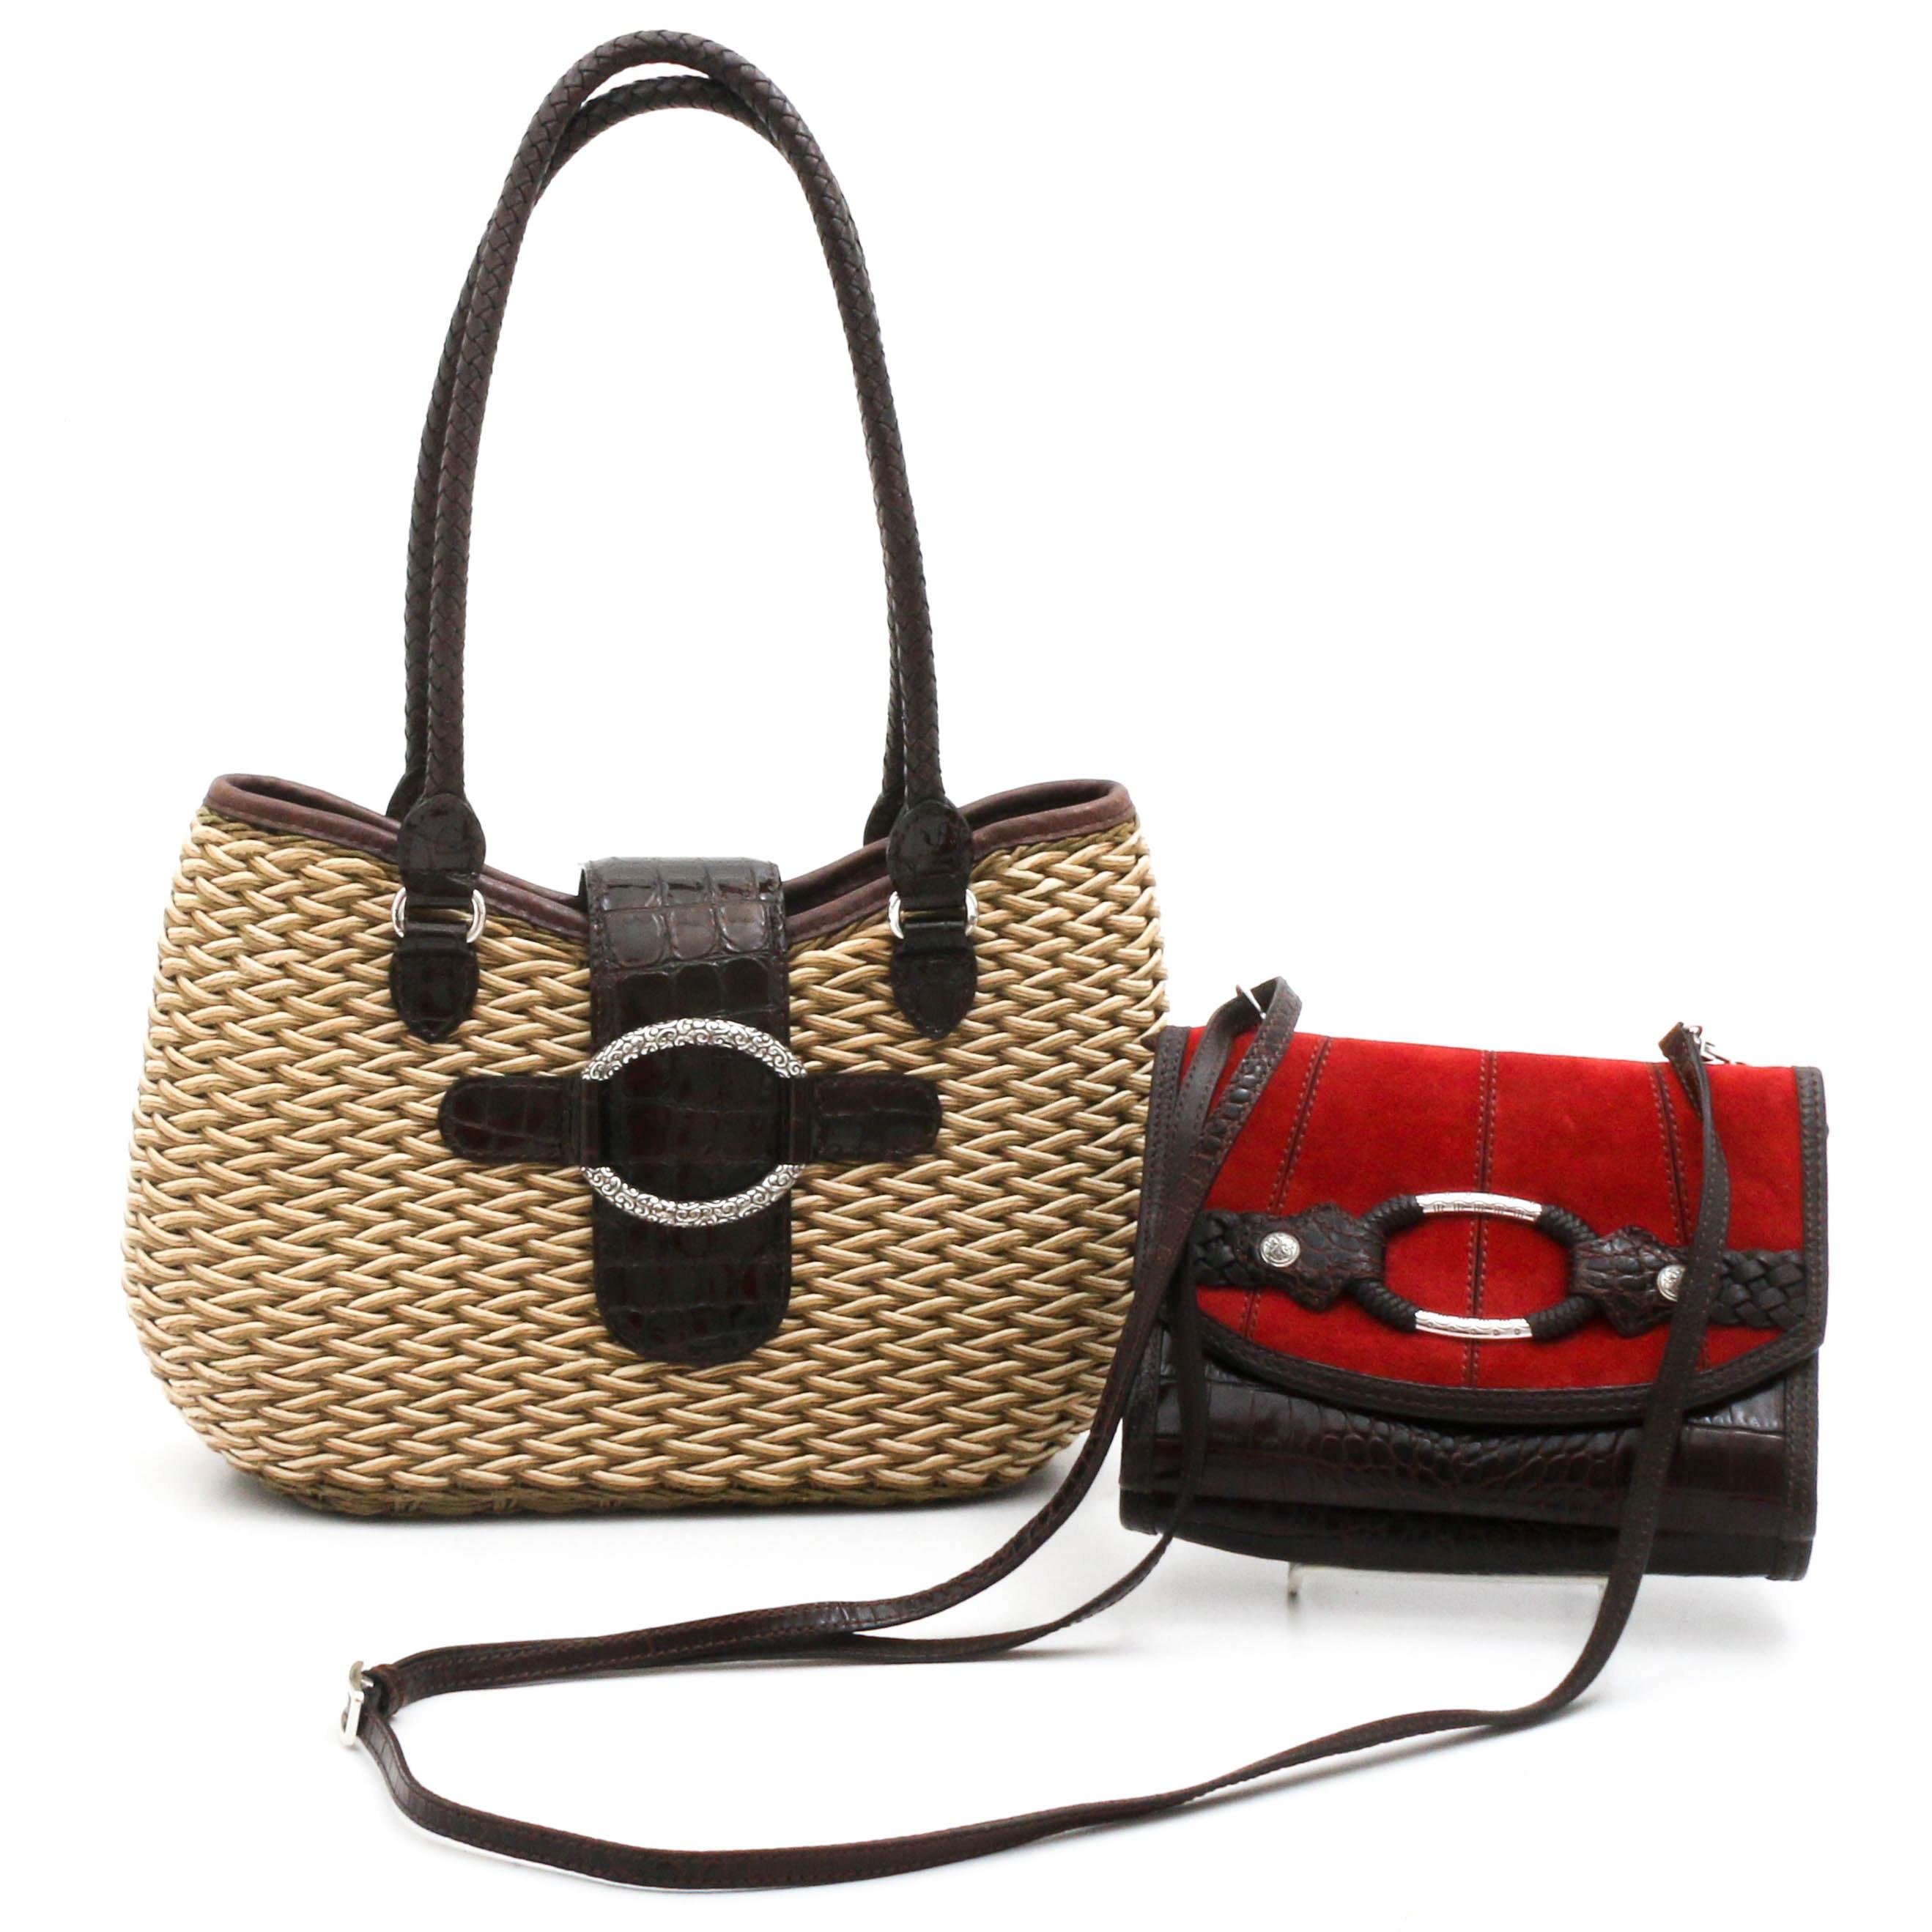 Brighton Handbag and Crossbody Wallet